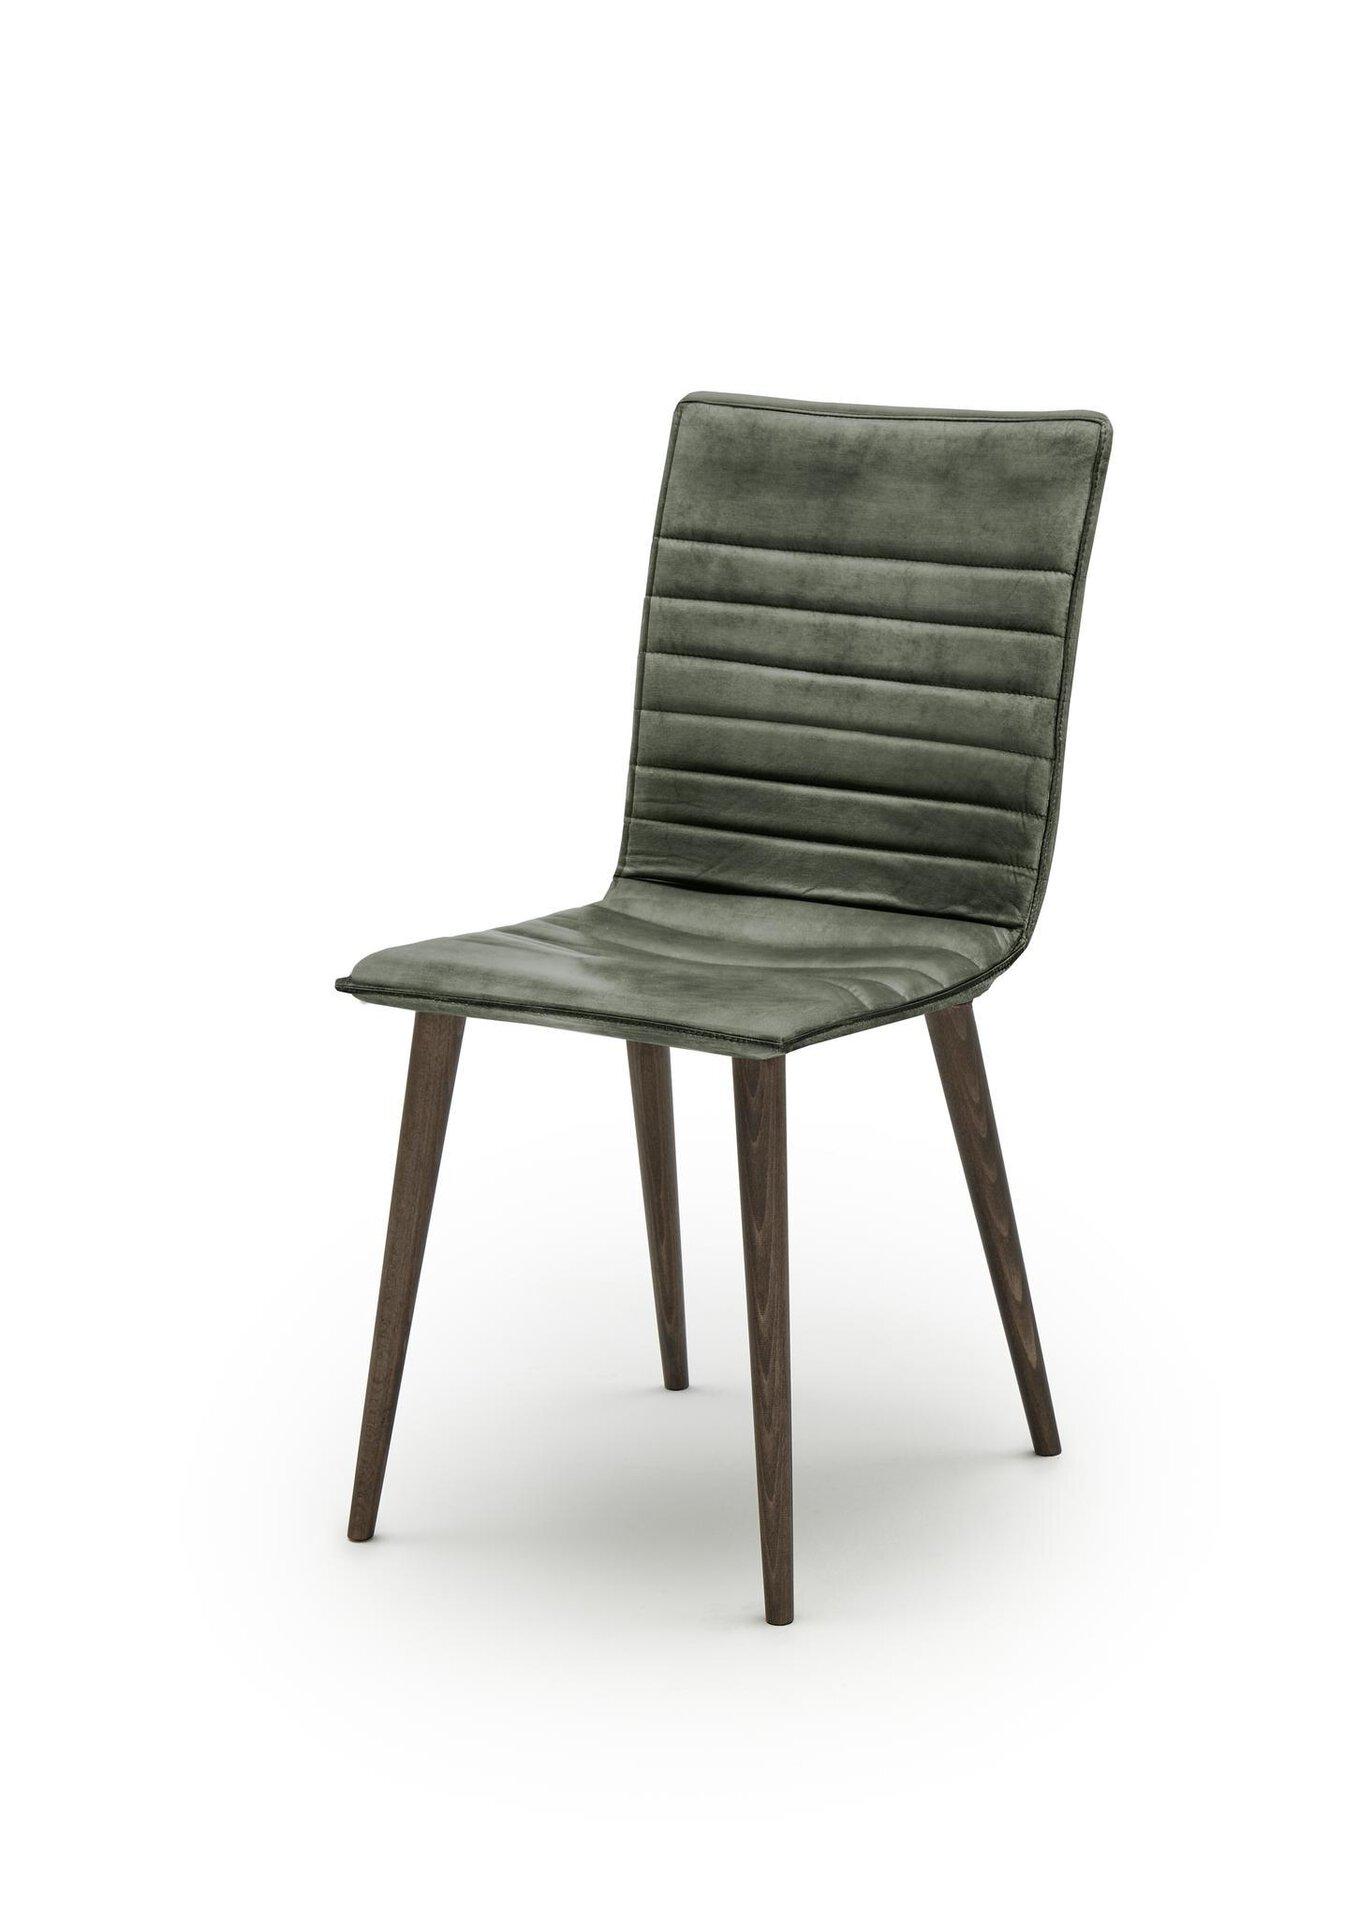 4-Fuß-Stuhl WK7010 Sabina Skinny WK Wohnen Edition Leder grün 56 x 85 x 41 cm